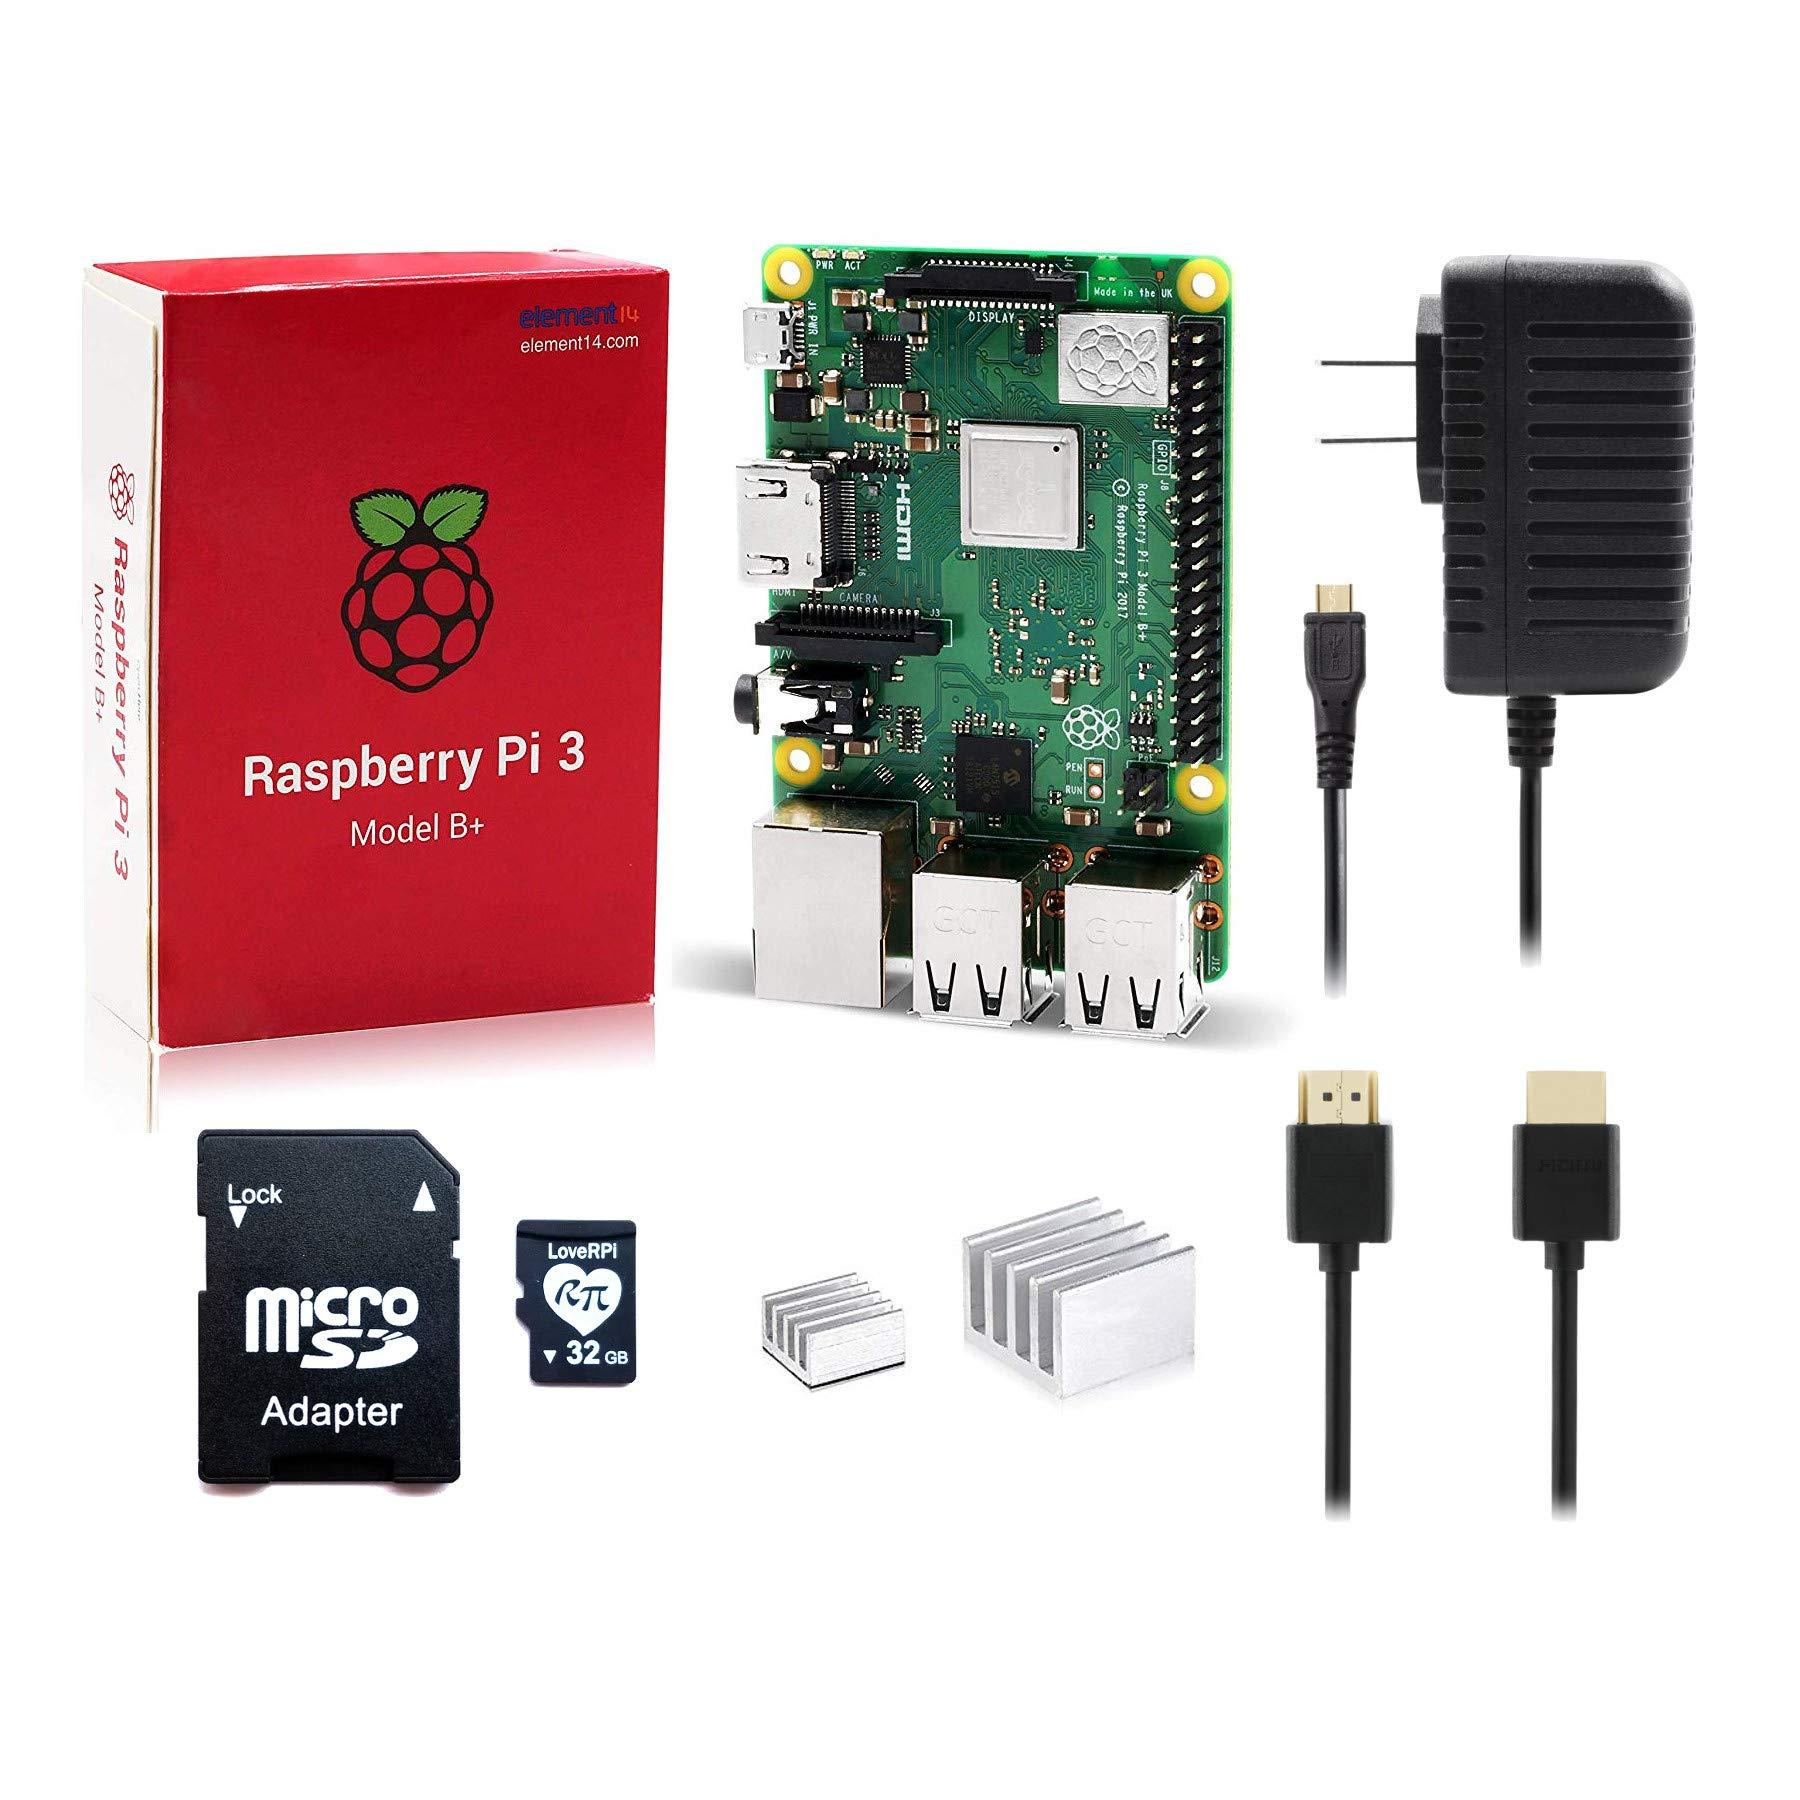 LoveRPi Raspberry Pi 3 B+ 32GB Plug and Play Starter Kit with Raspbian Desktop